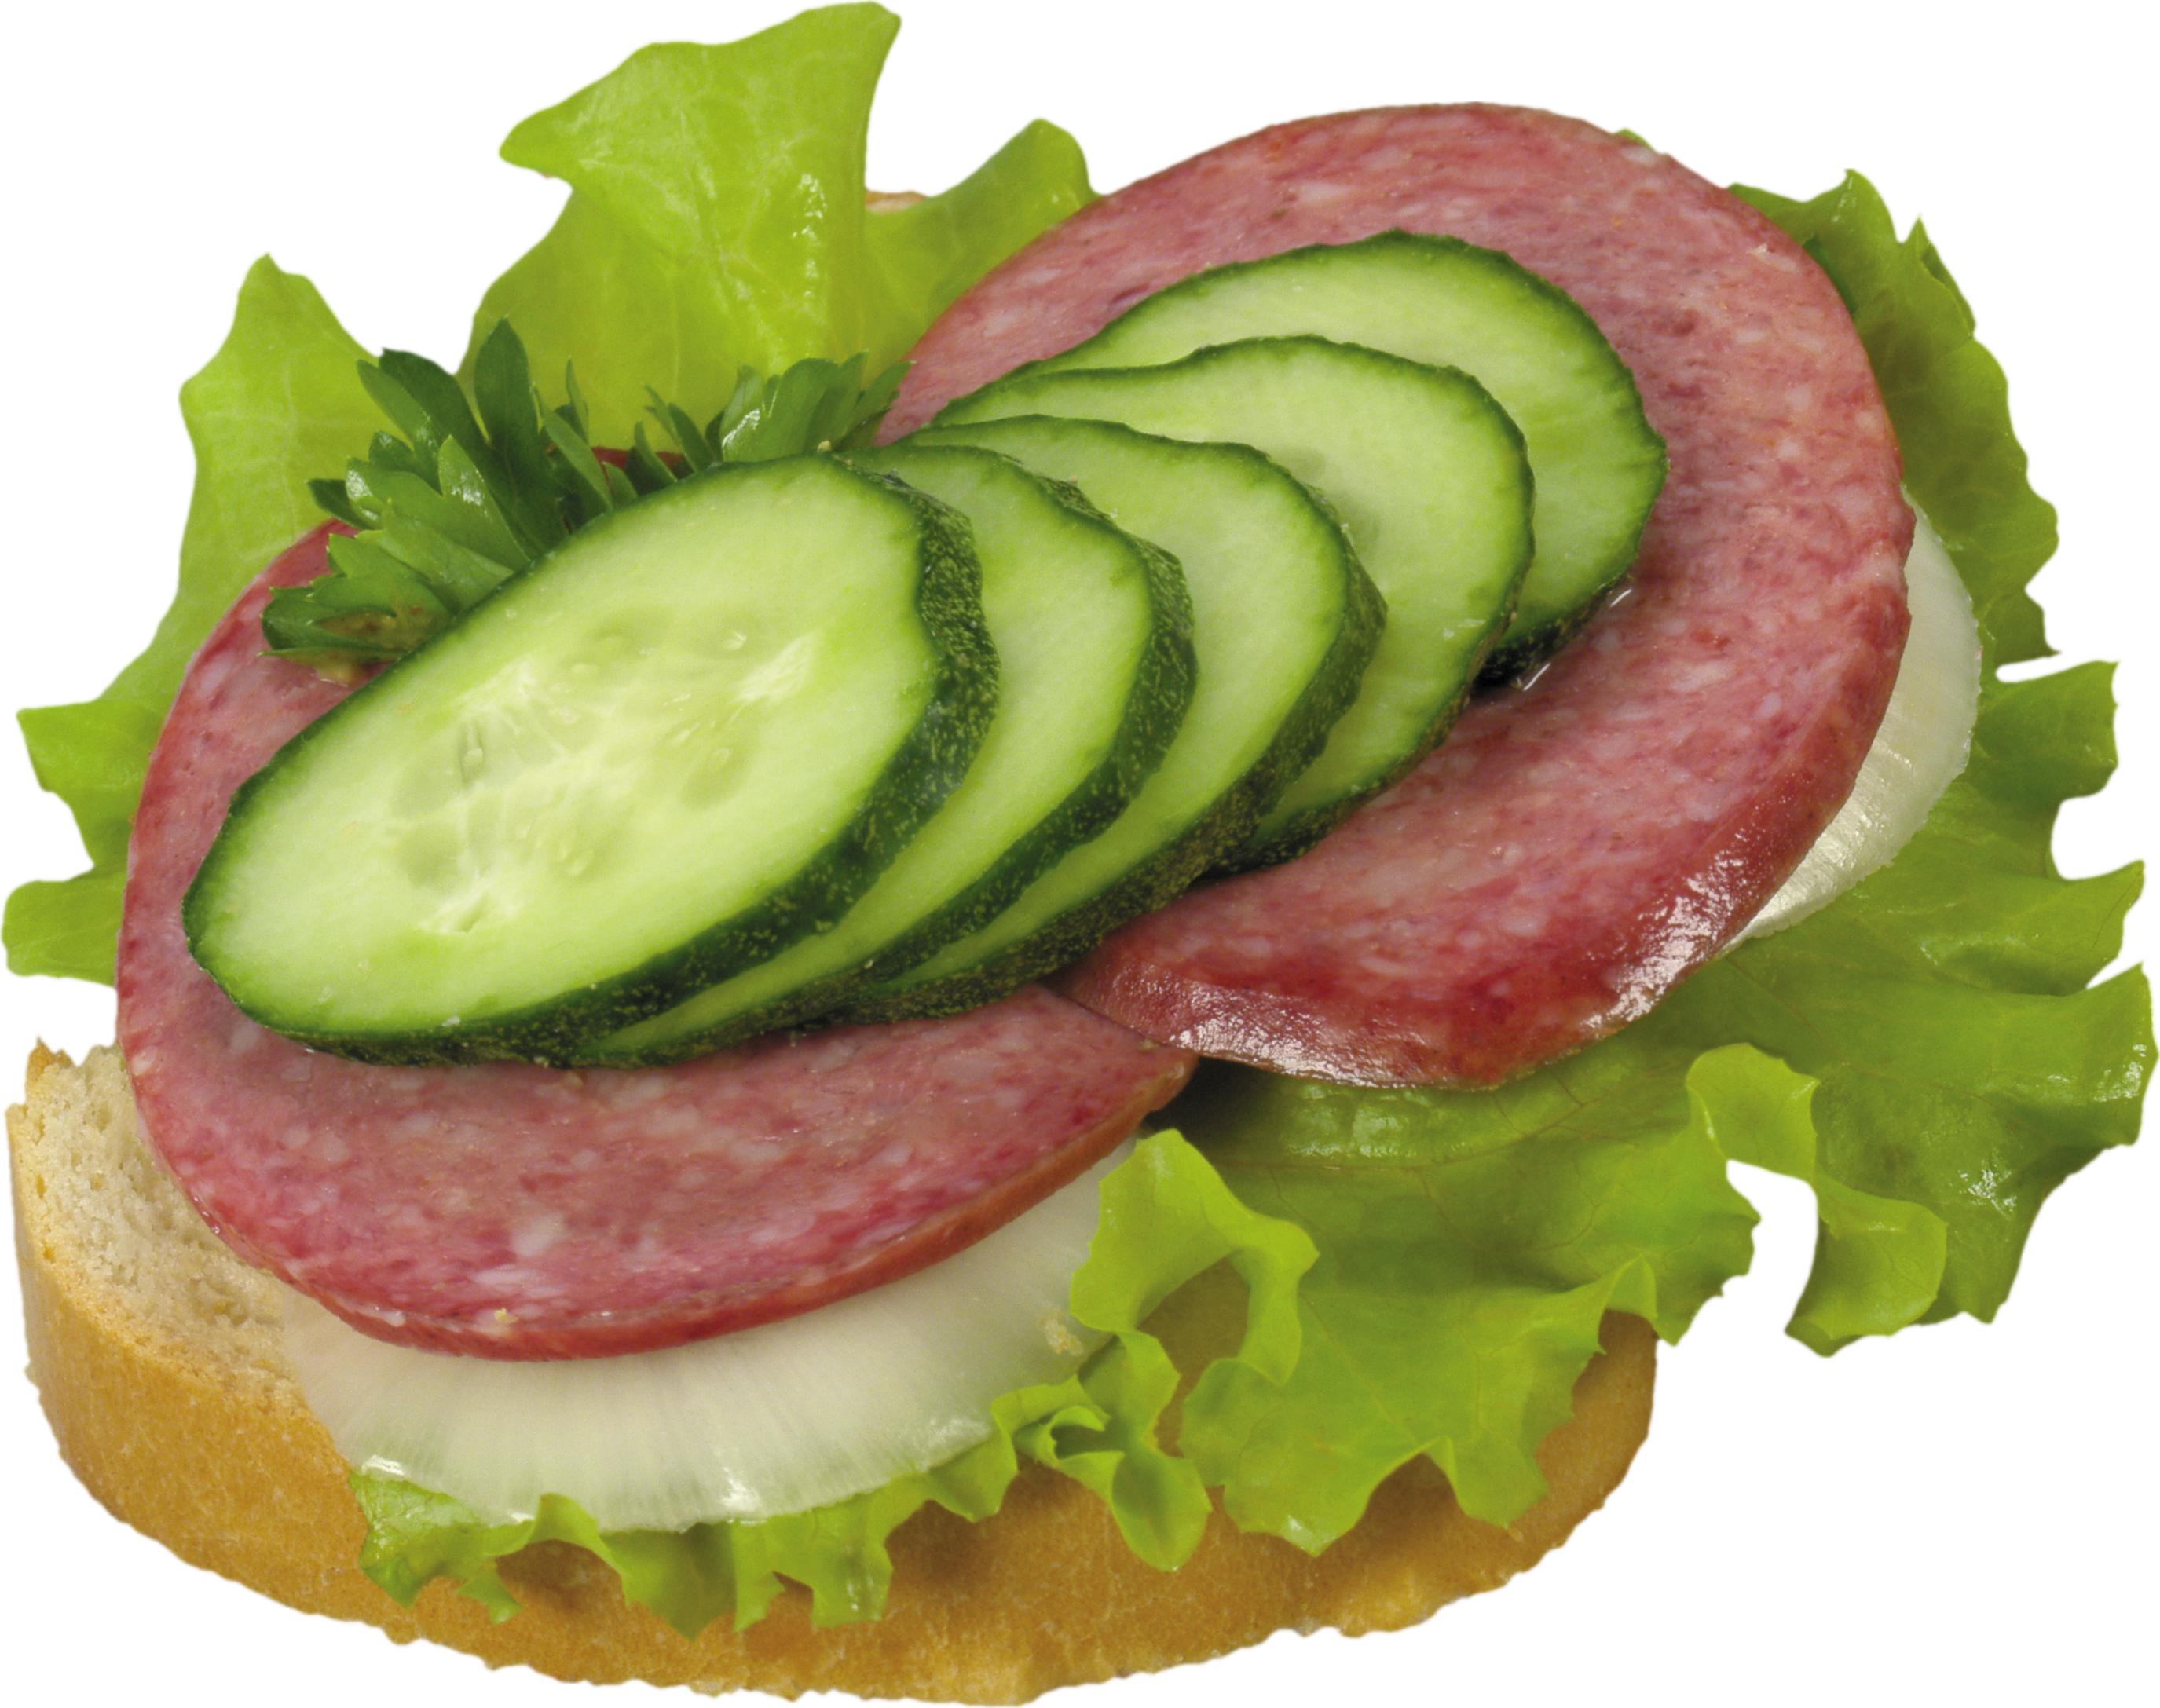 Ham png images free. Potato clipart spiral potato